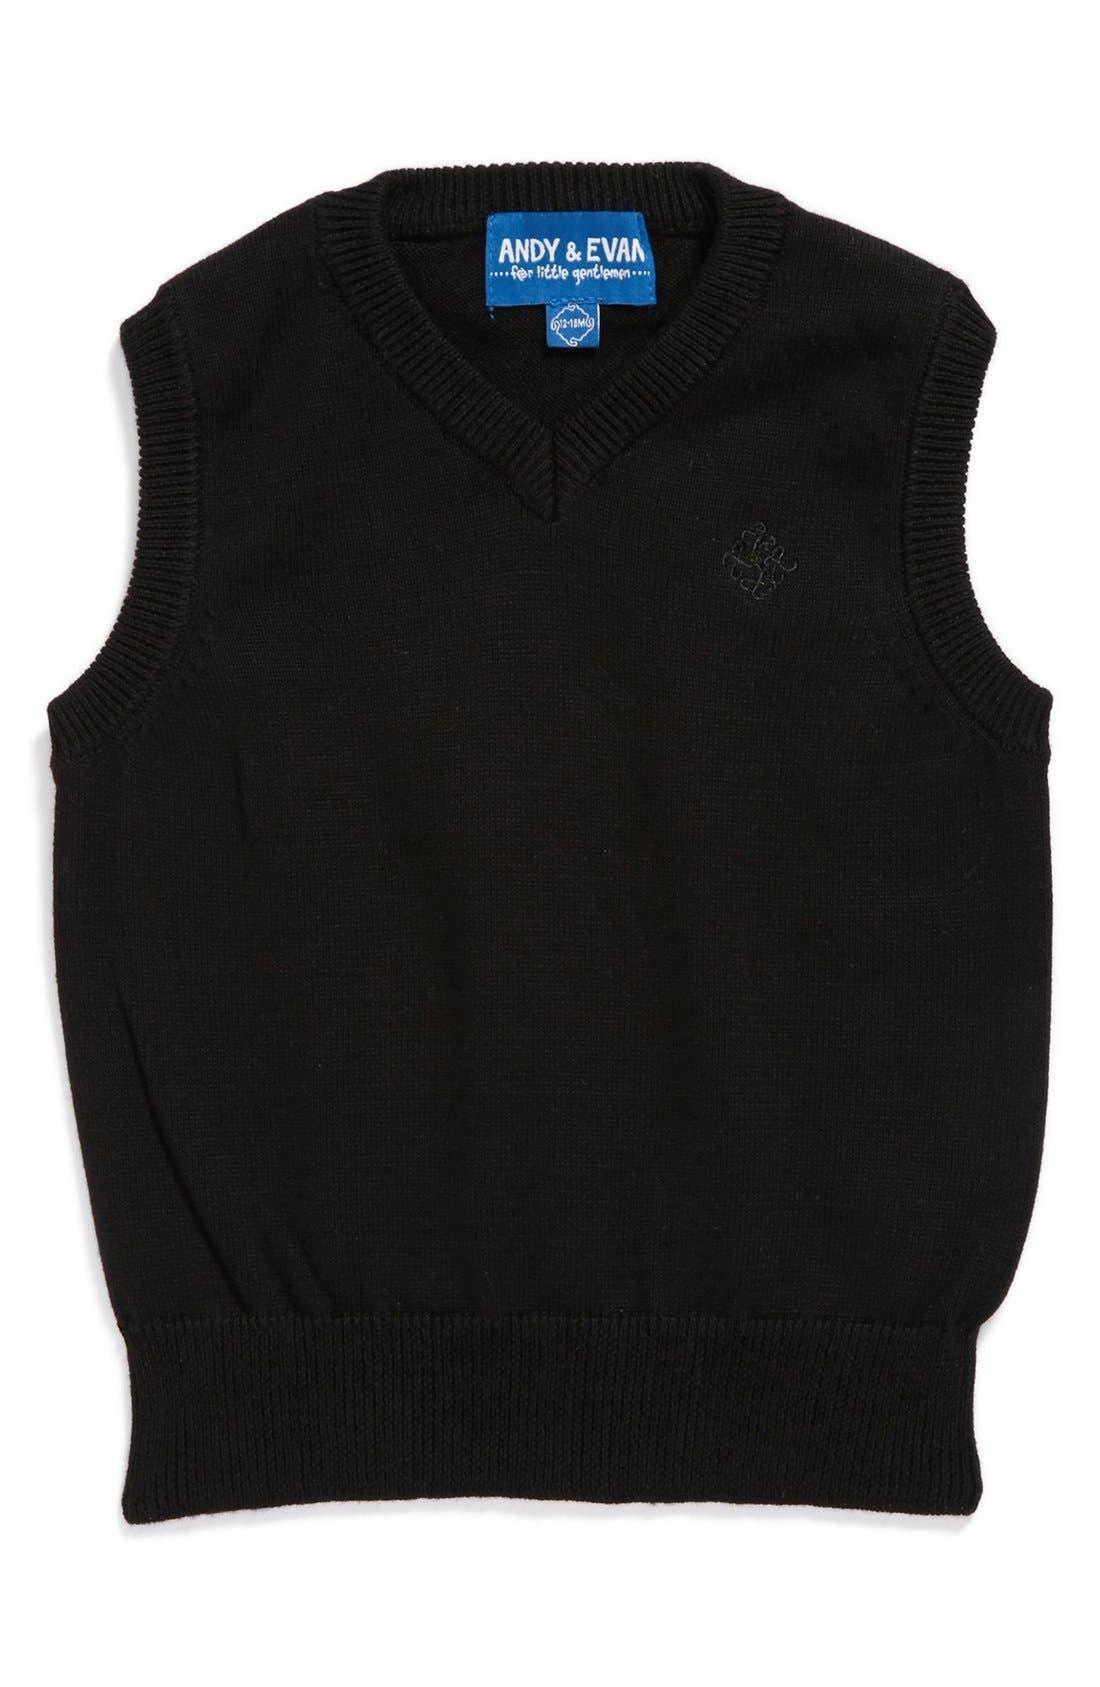 Alternate Image 1 Selected - Andy & Evan for little gentlemen Sweater Vest (Baby Boys)